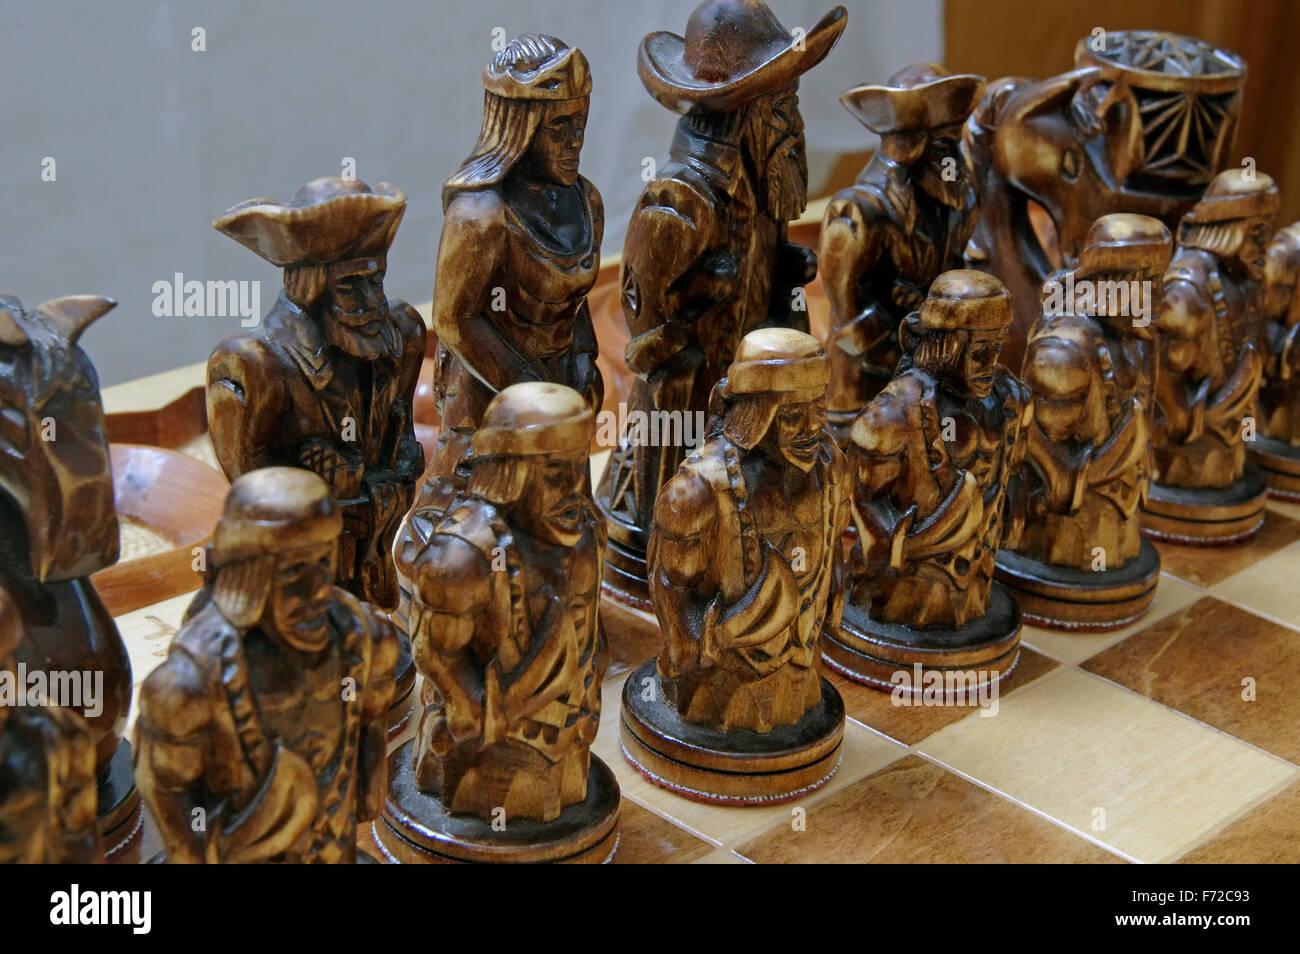 8cc81b74fb8d wood chess figures handmade stay on board Stock Photo  90407999 - Alamy